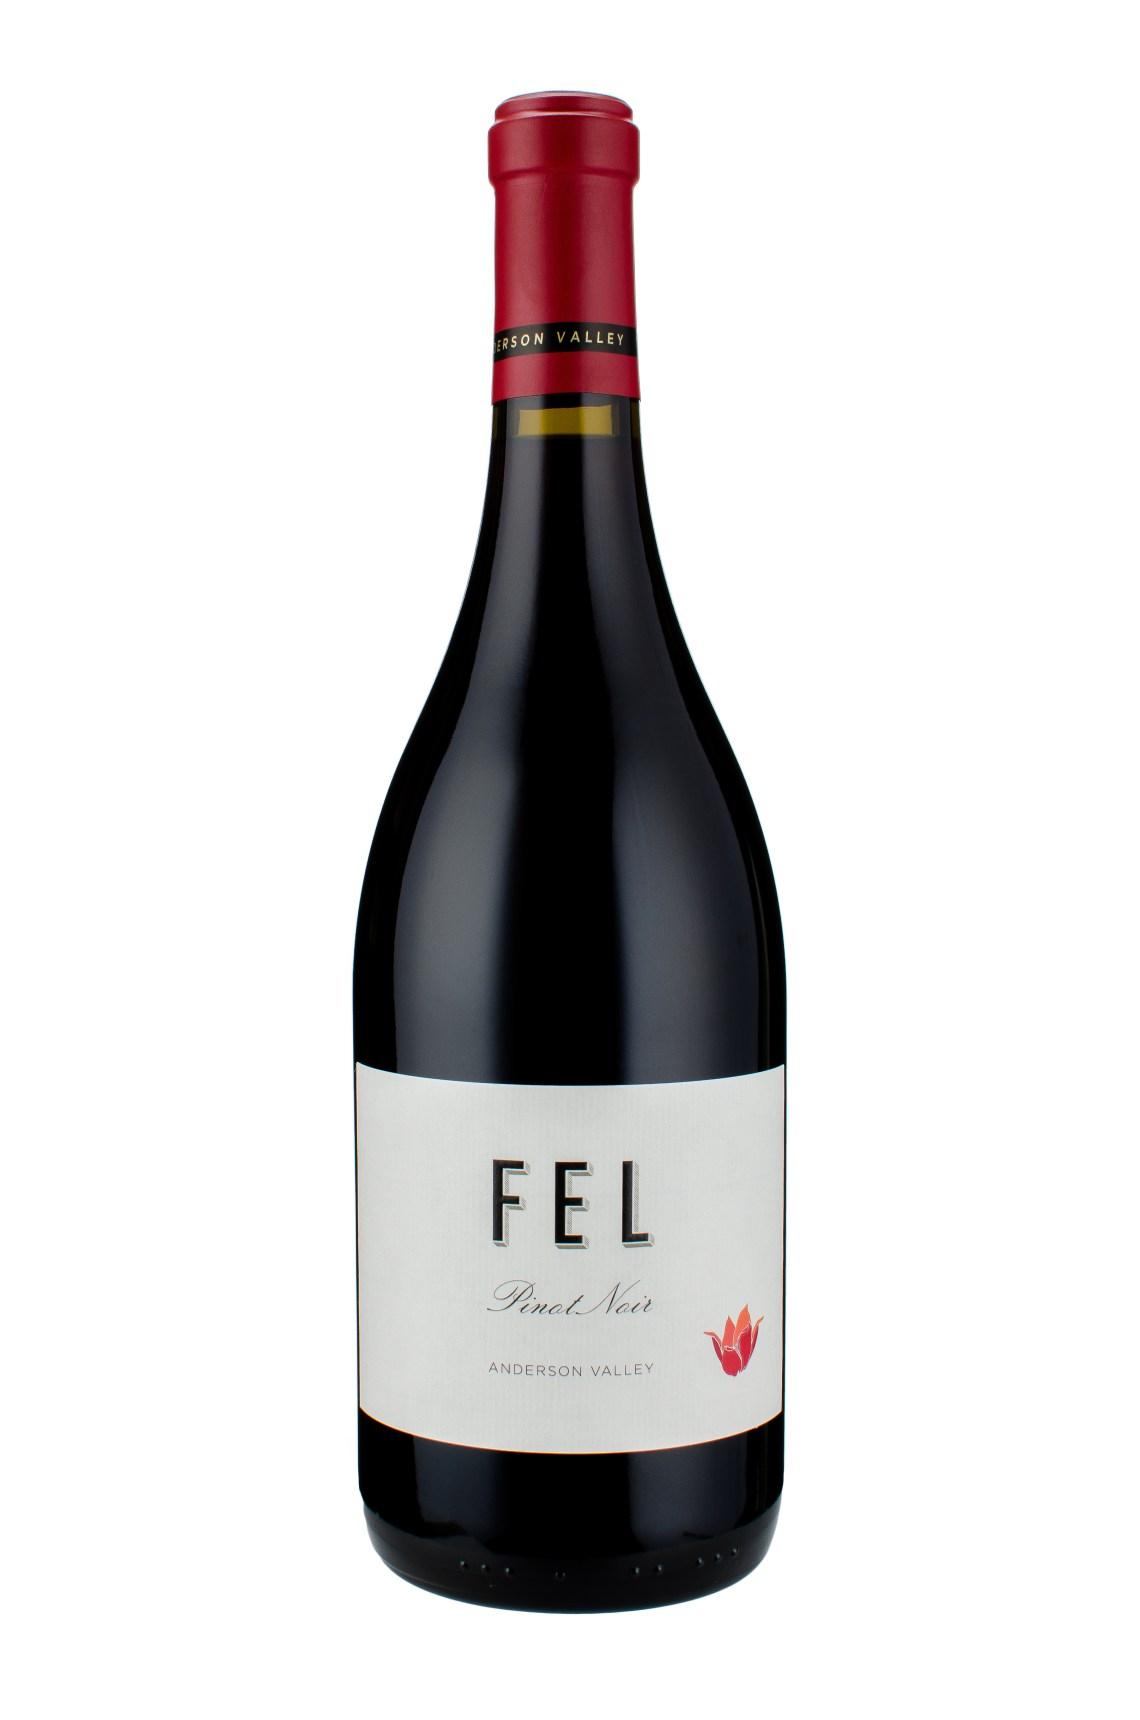 2016 FEL Pinot Noir Anderson Valley